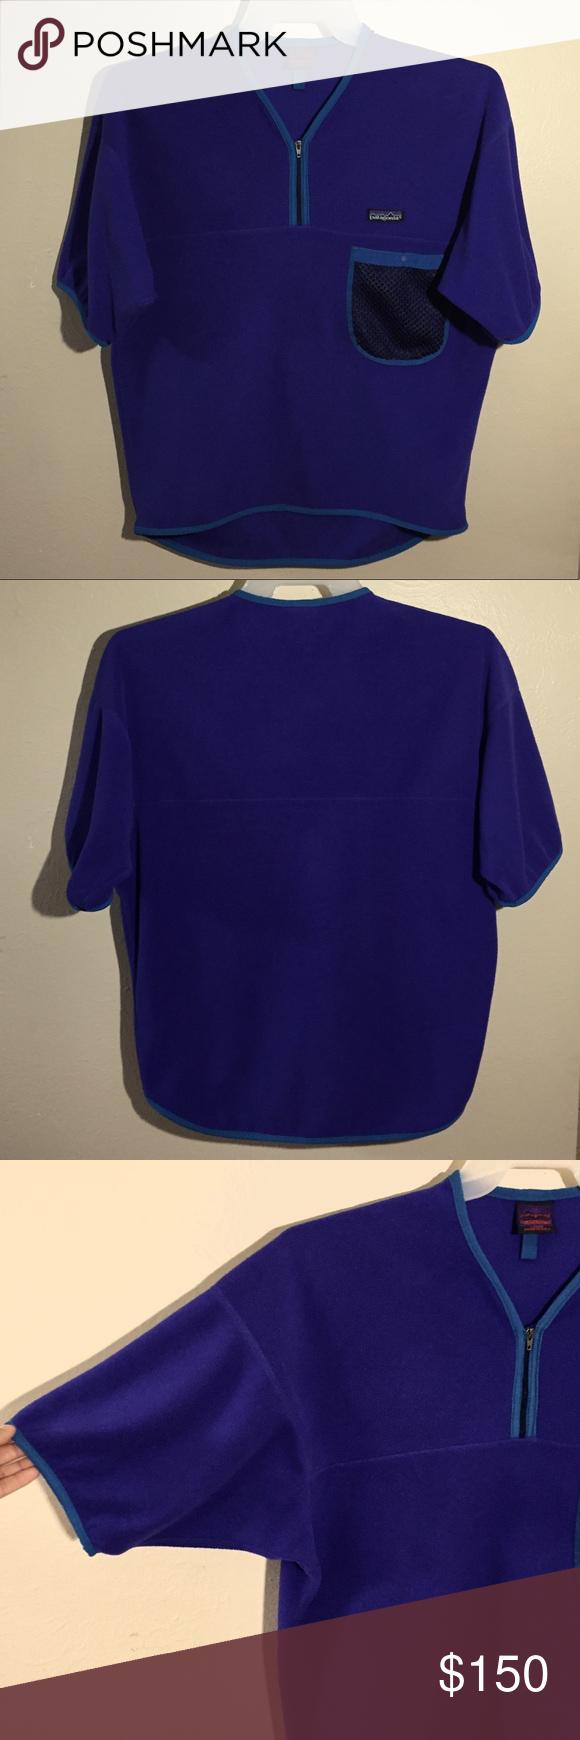 Vintage s patagonia purple fleece sweater size l fleece sweater